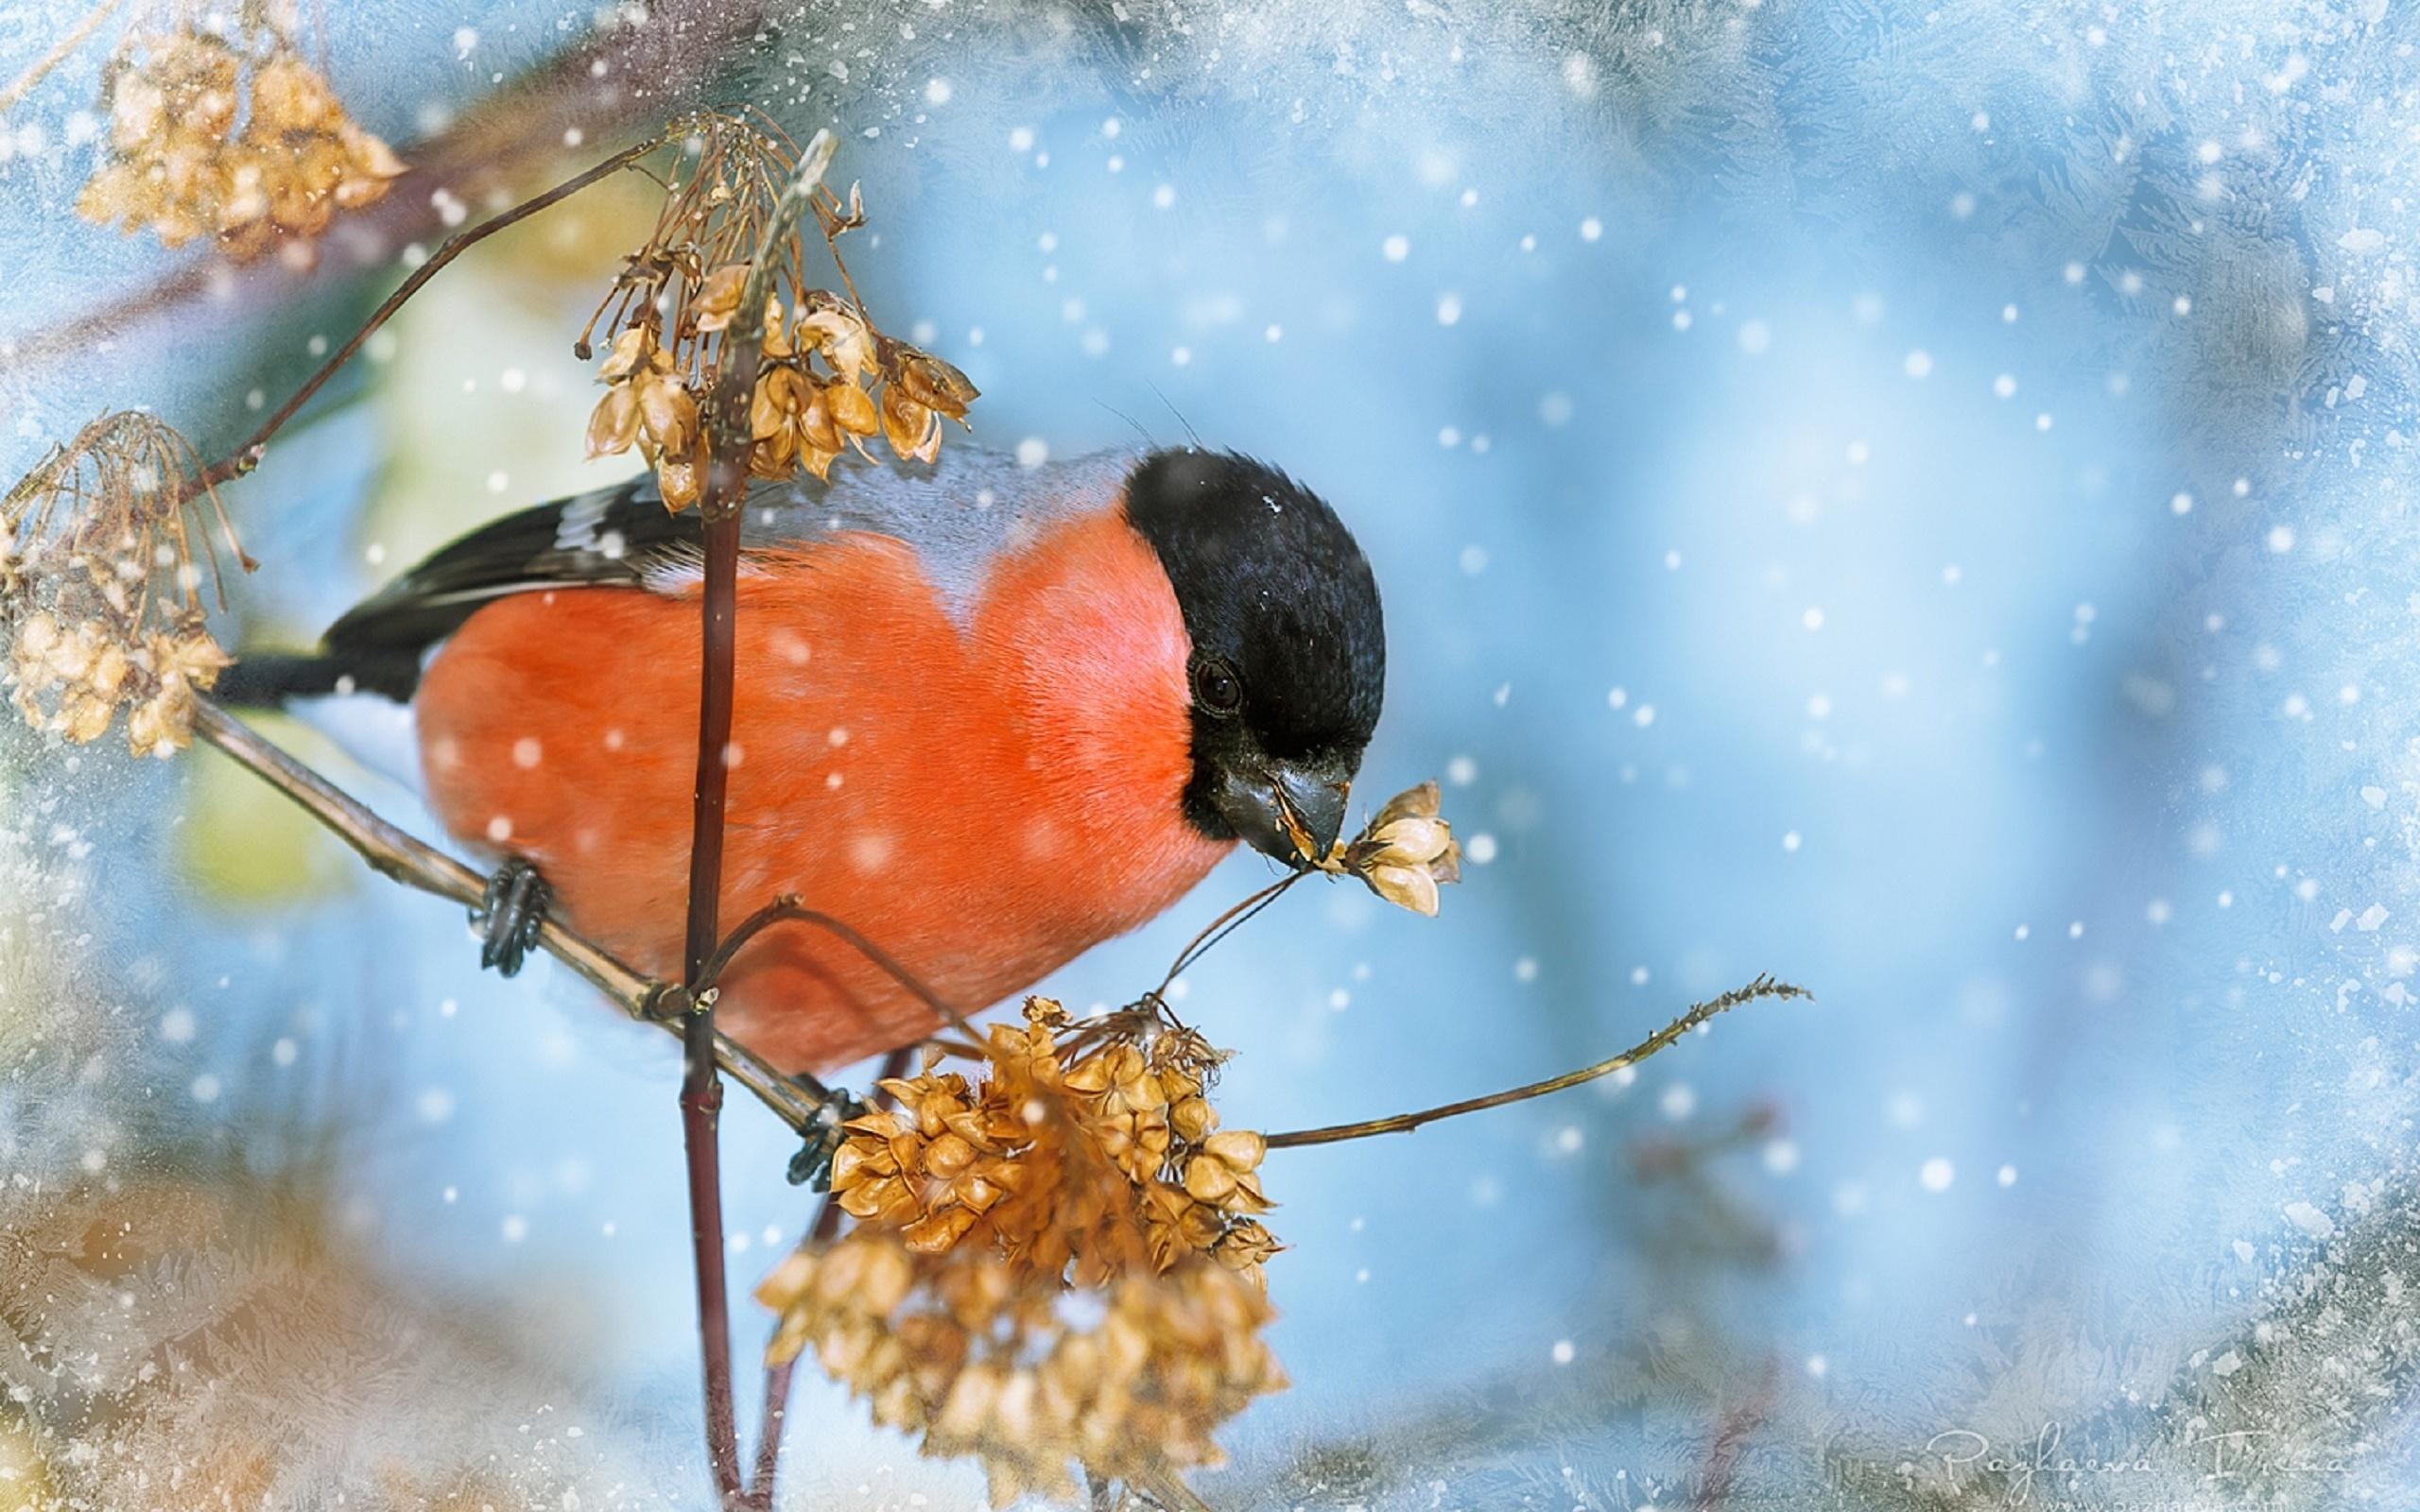 Картинка: Снегирь, веточка, снег